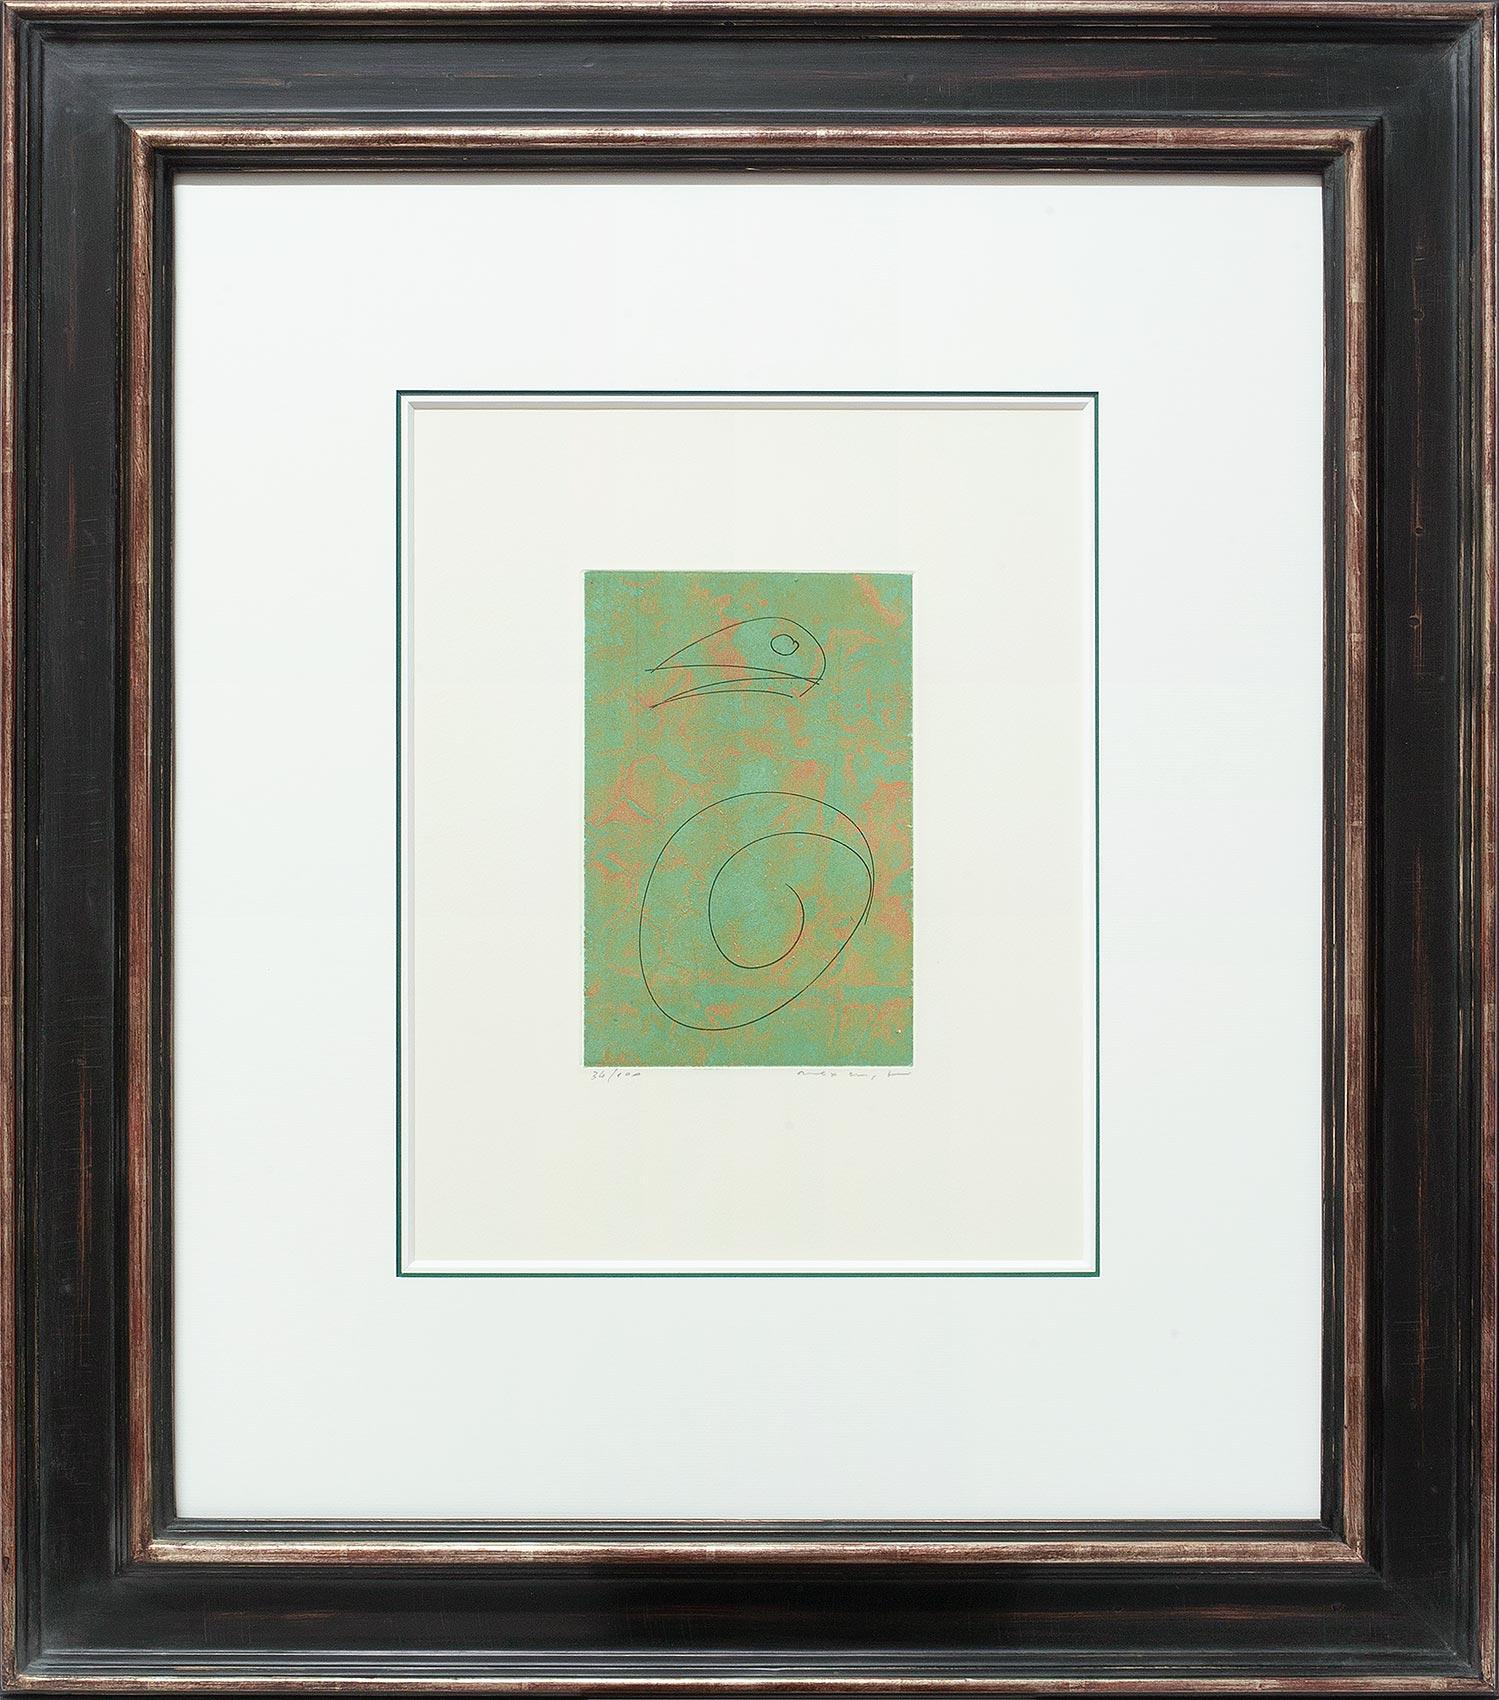 Max Ernst, Oiseau vert, Galerie Française